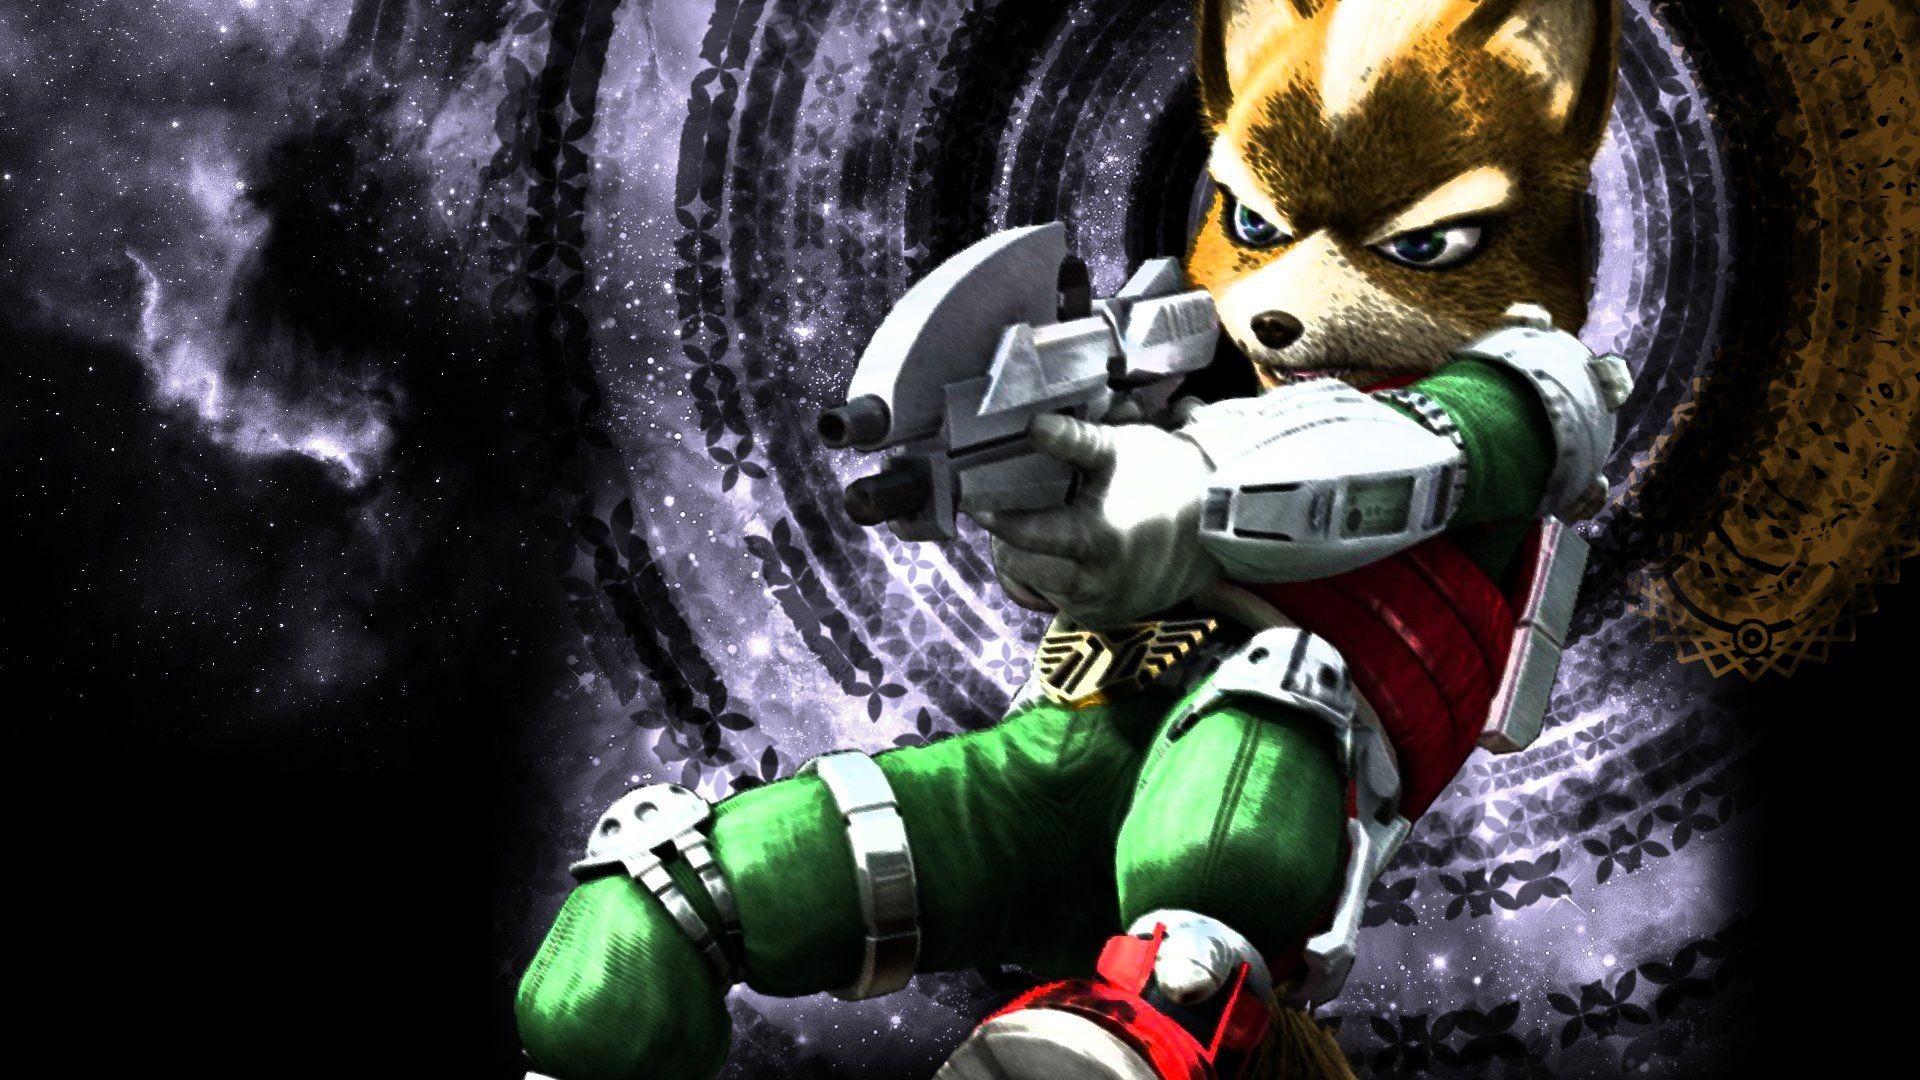 STARFOX shooter family nintendo sci-fi star fox (48) wallpaper .